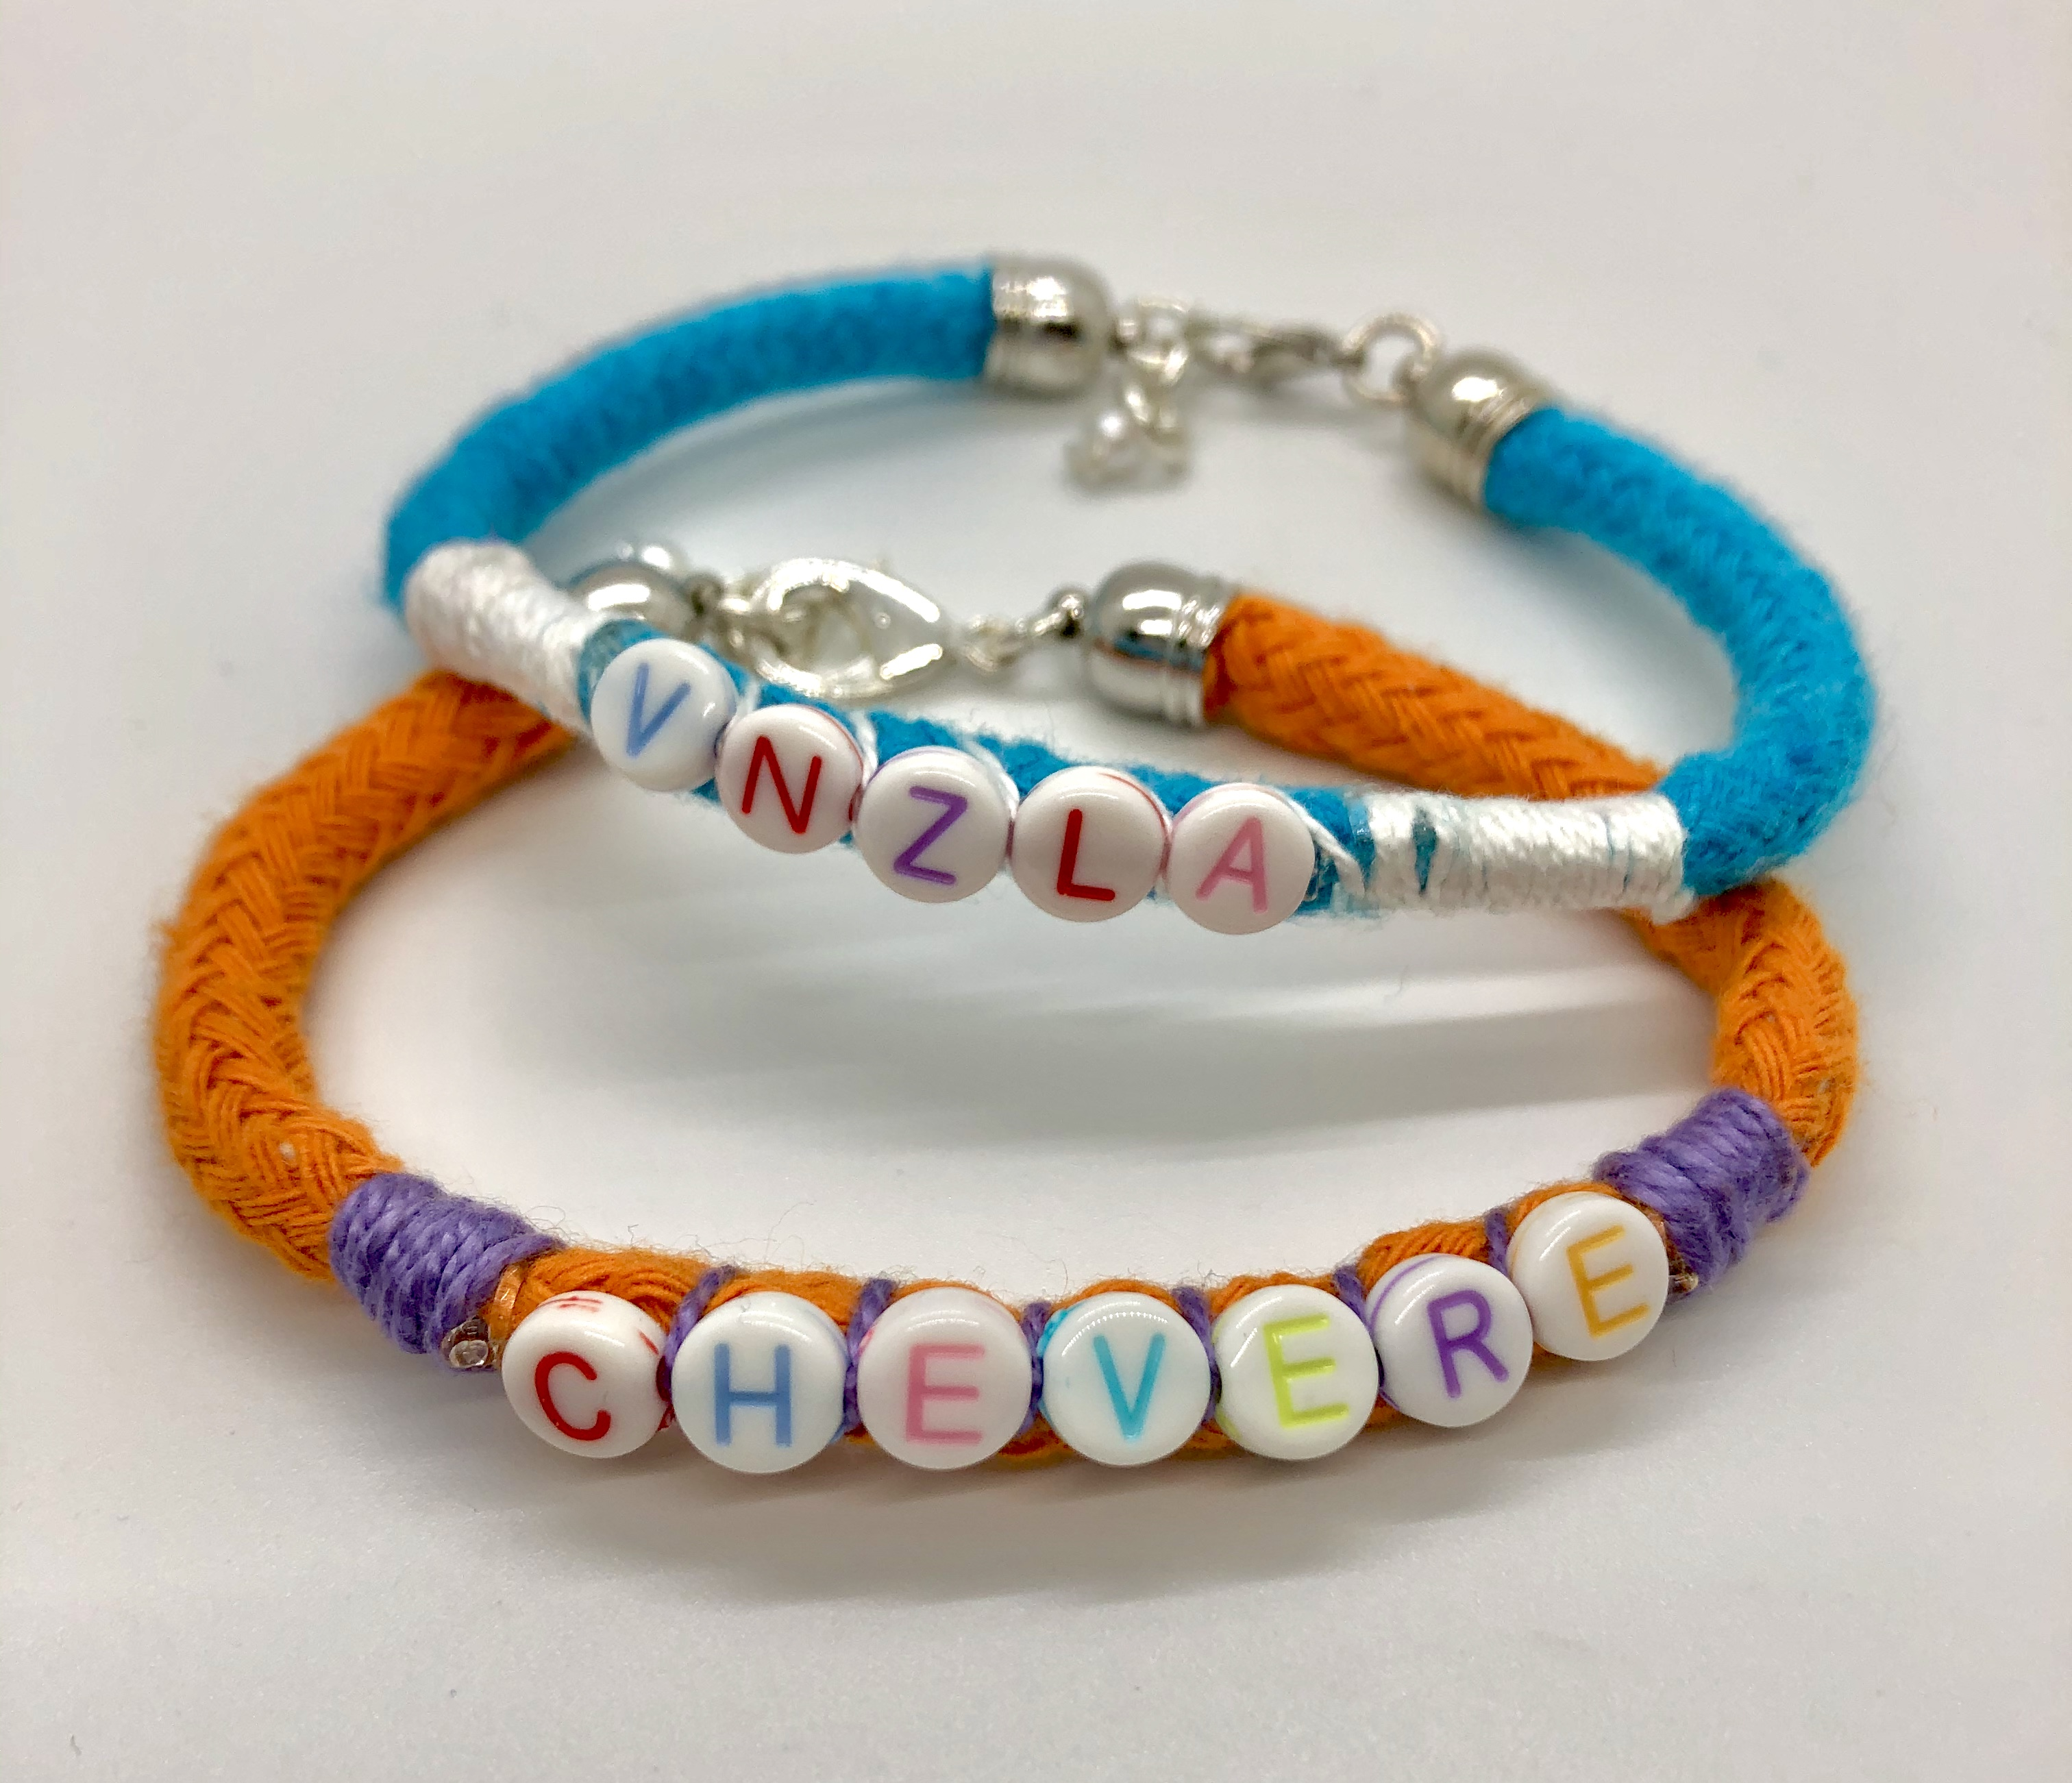 Venezuela Good Vibes Bracelets - Set of 2.